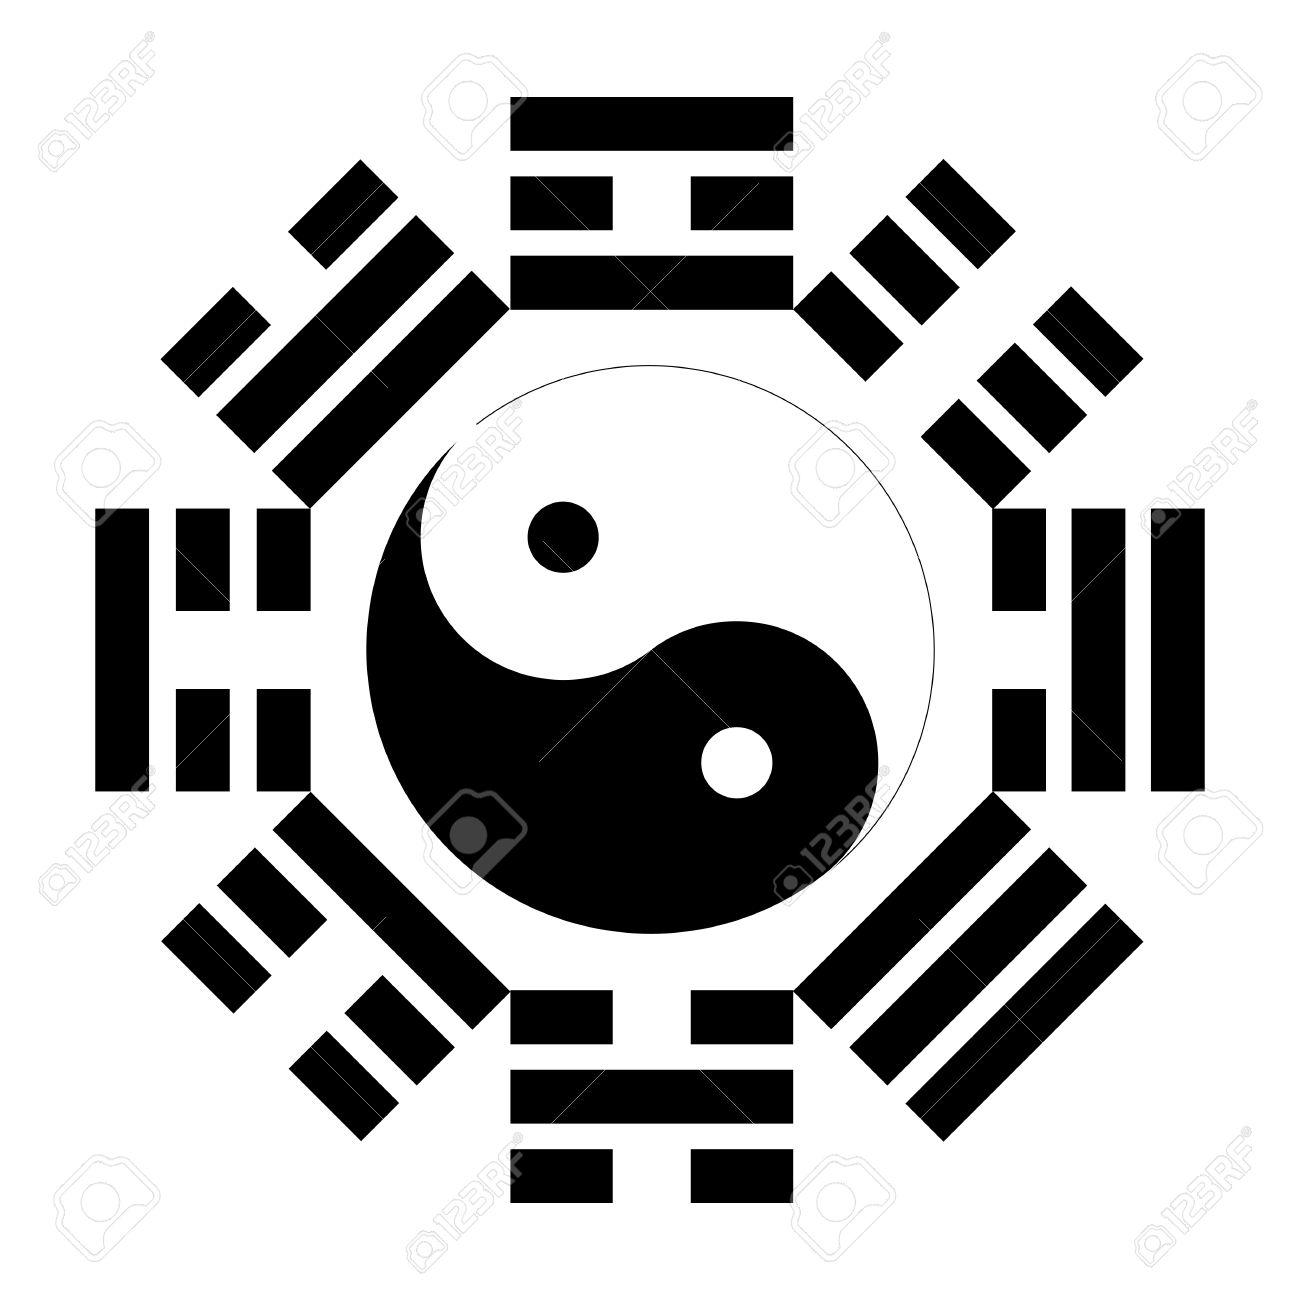 Taoism Symbols Dragon: Taoism Symbols